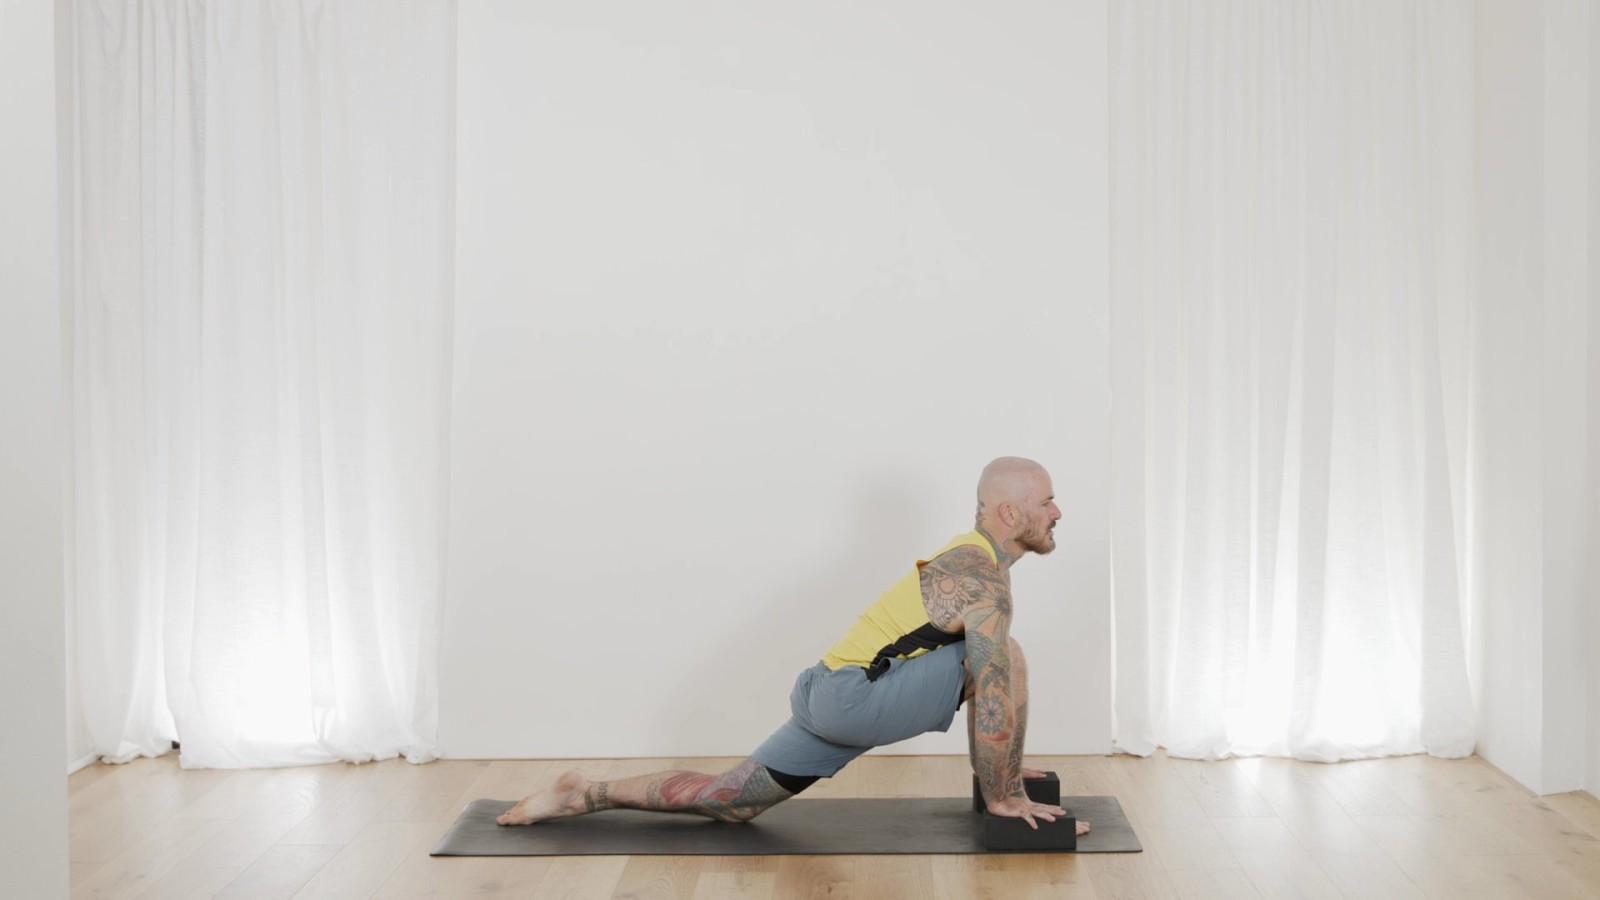 Yoga Foundations - Learn Classical Sun Salutation with Ari Levanael